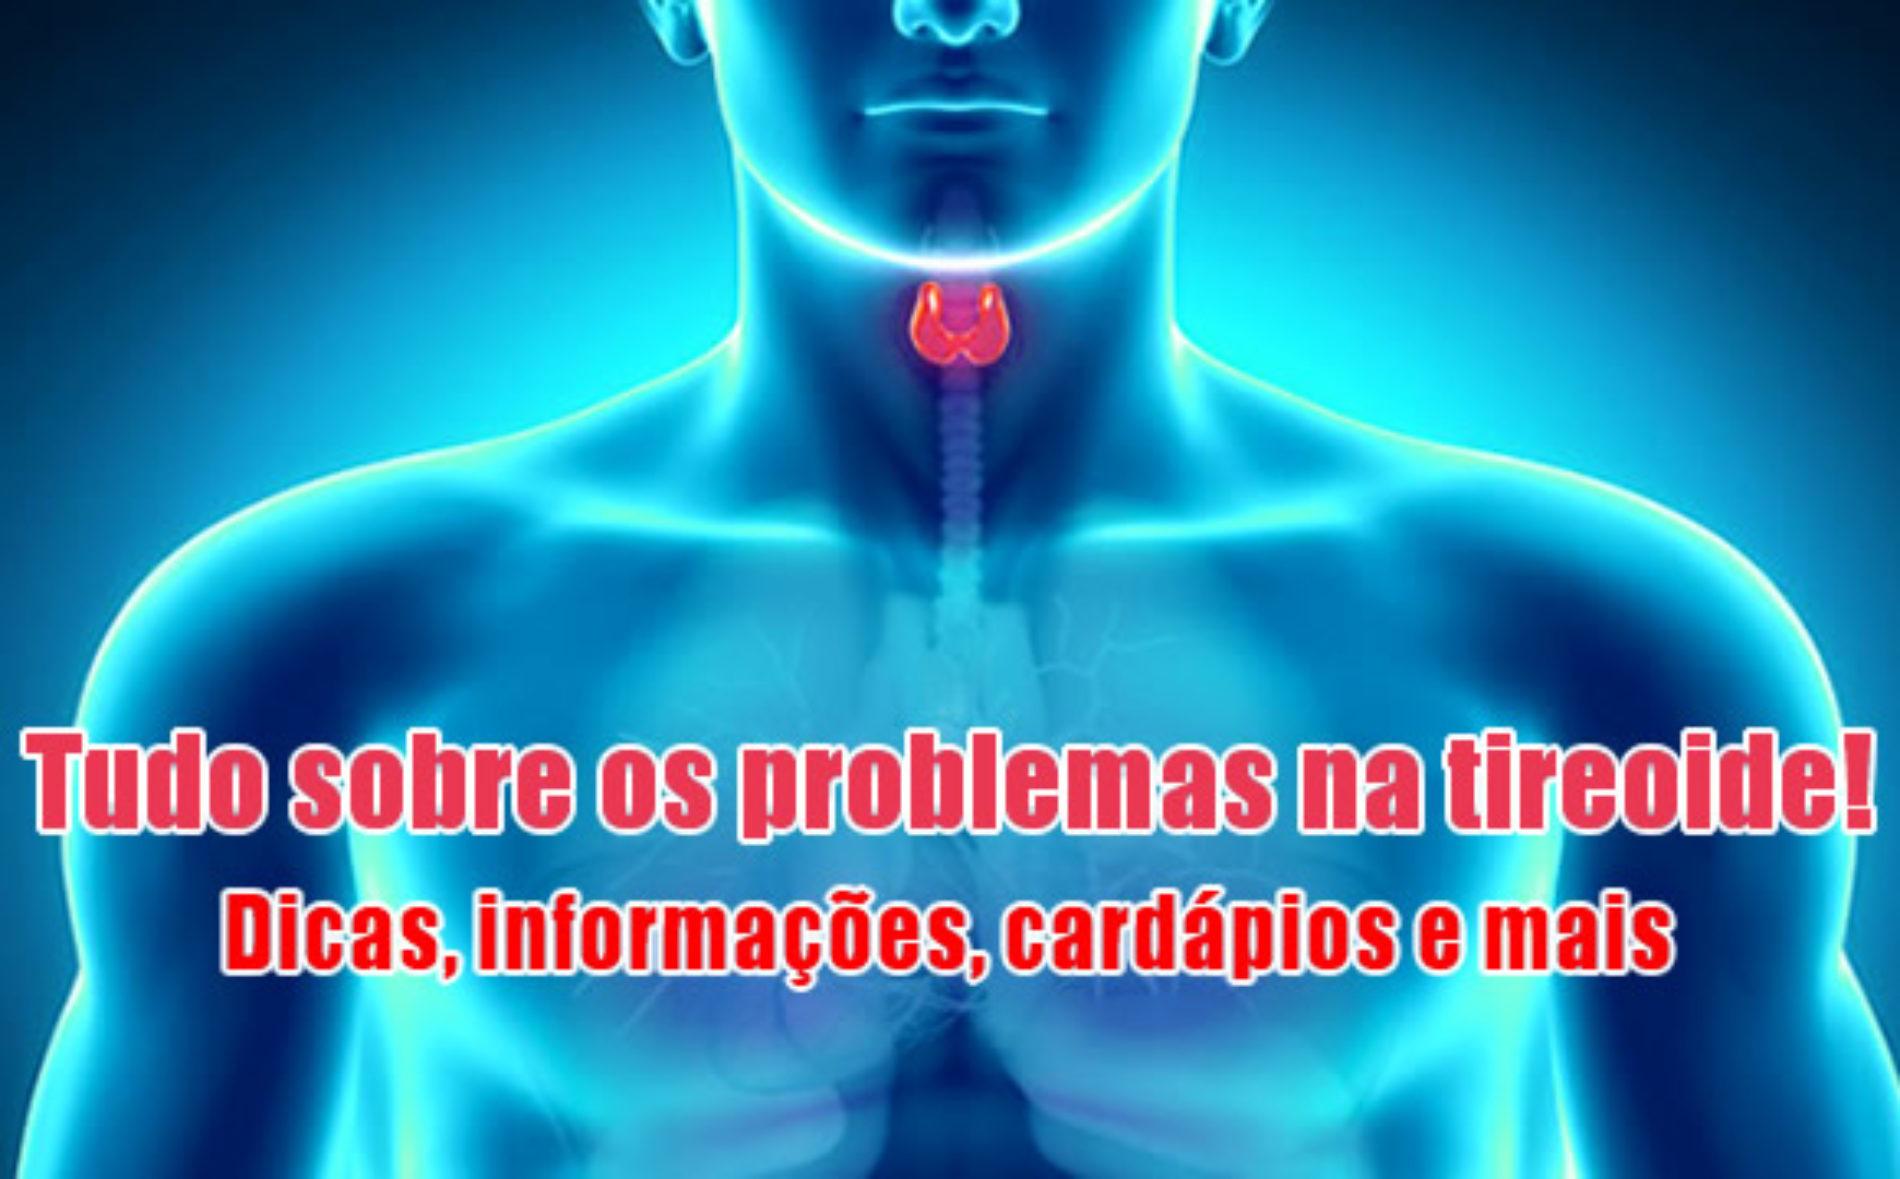 Dieta Hipertireoidismo e Hipotireoidismo – Cardápio de uma semana